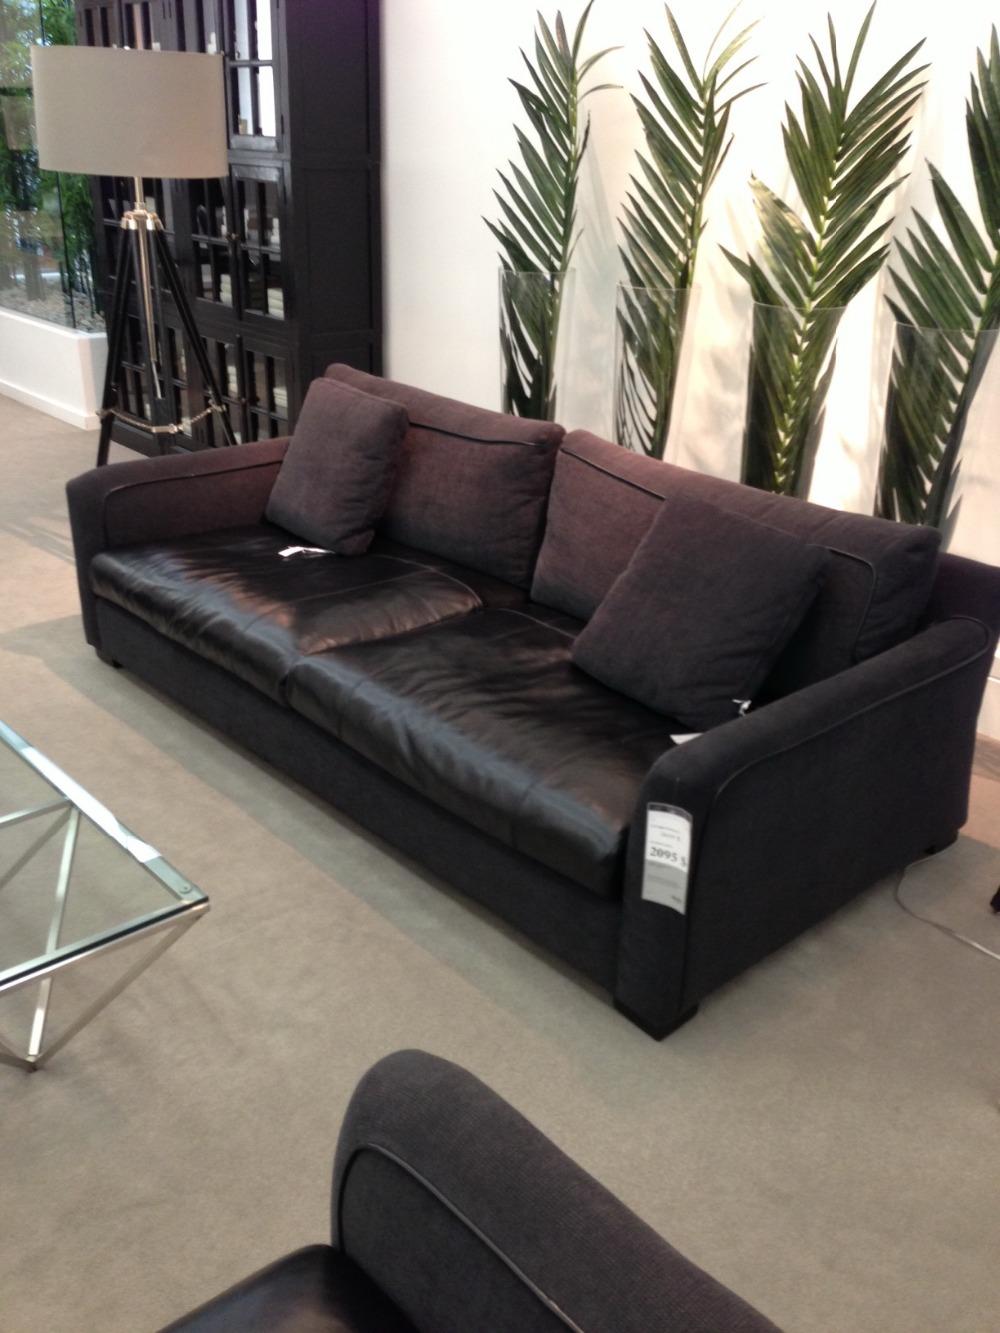 astounding formal living room sofa sets furniture | Modern living room sofa 3 French Designer genuine leather ...